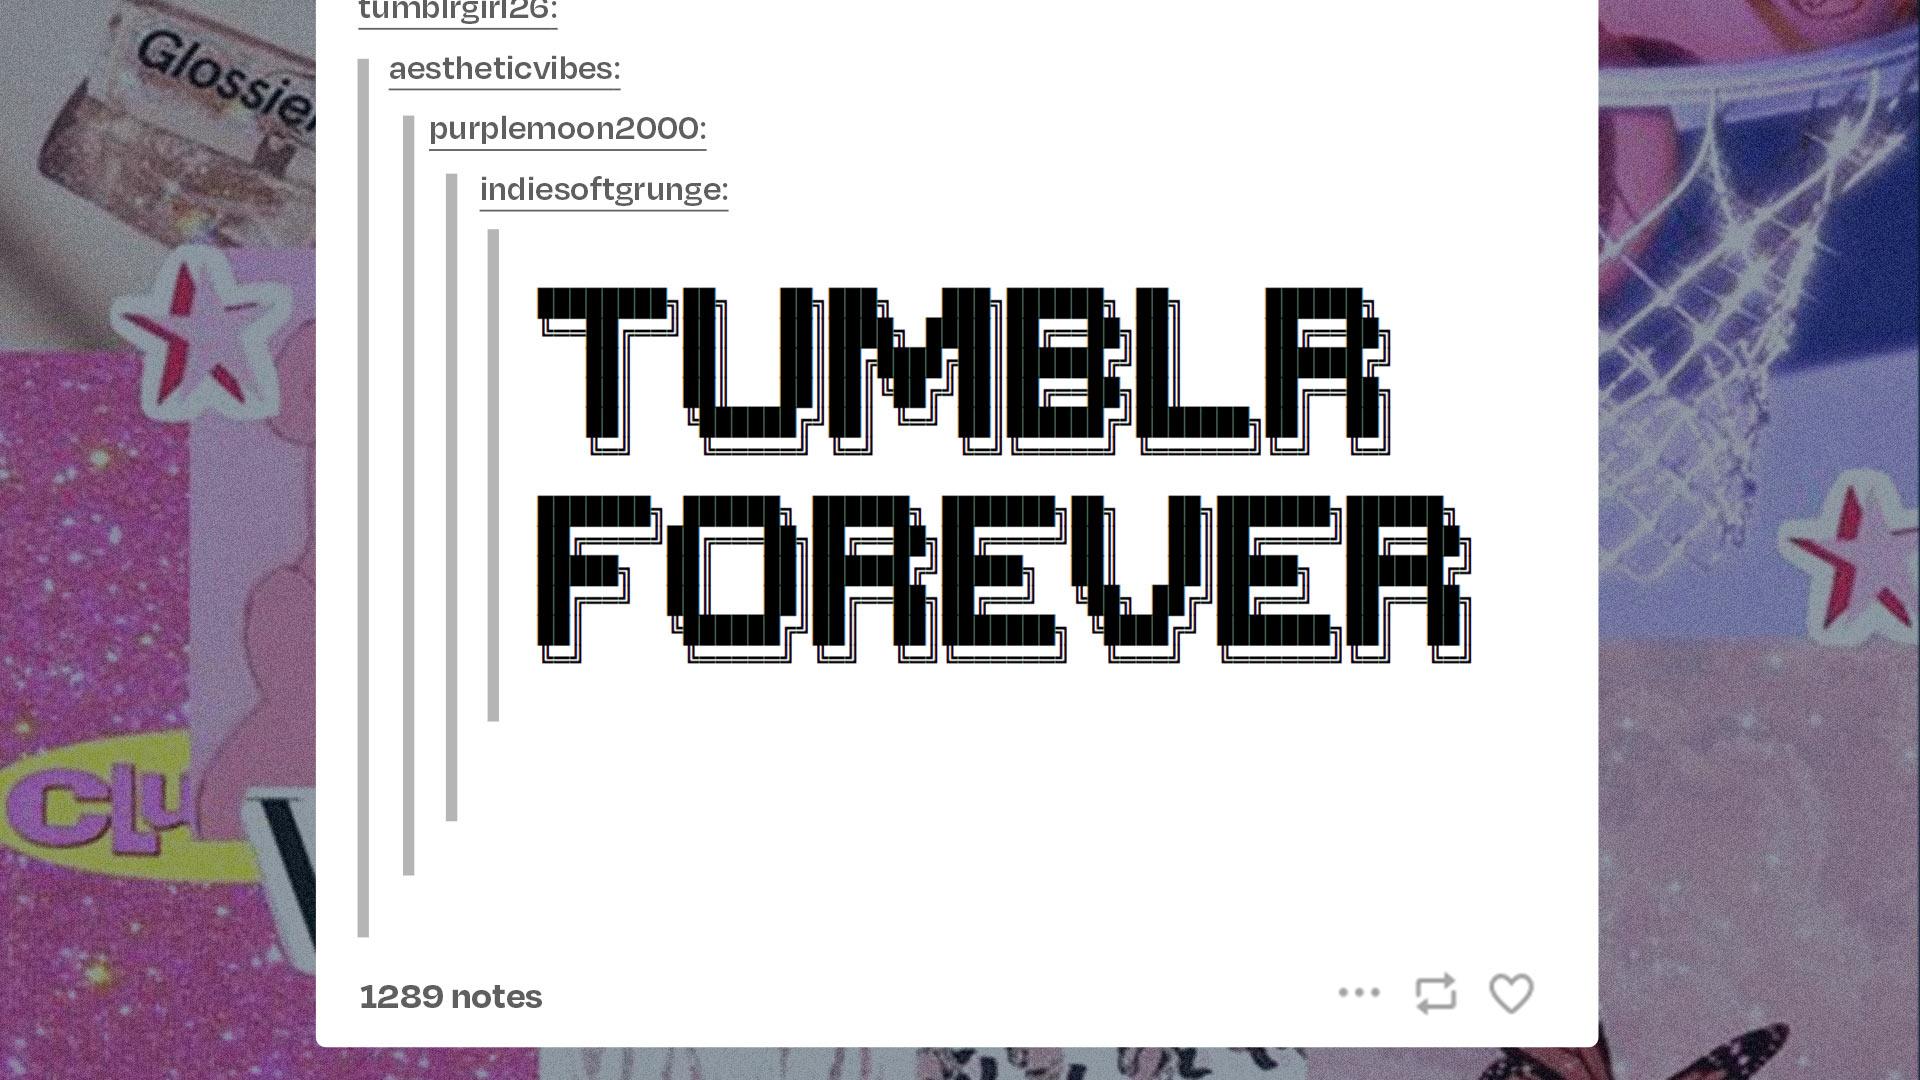 storia di tumblr